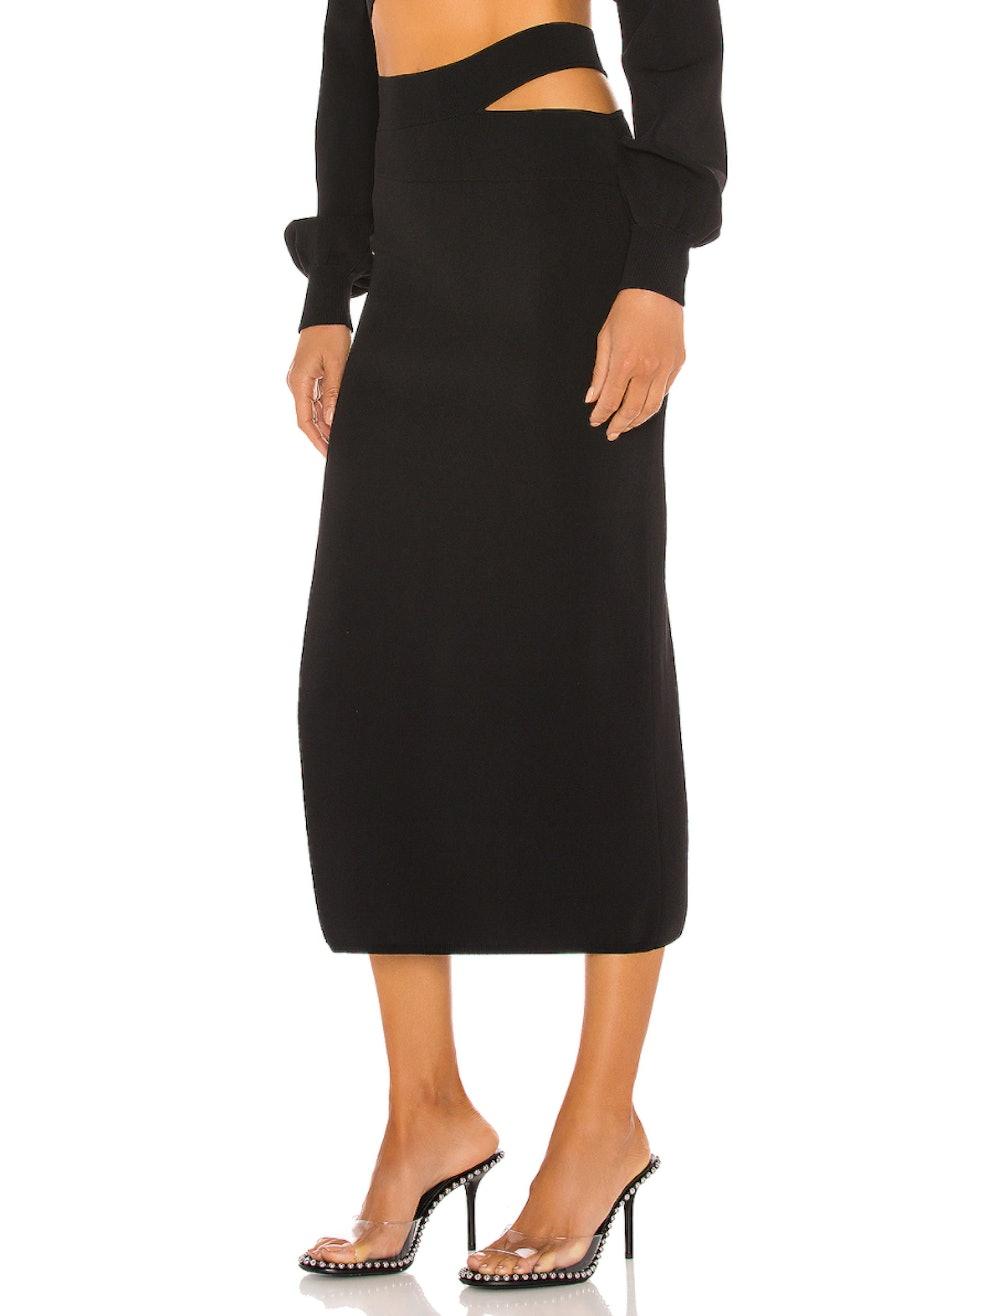 Cut Out Knit Midi Skirt